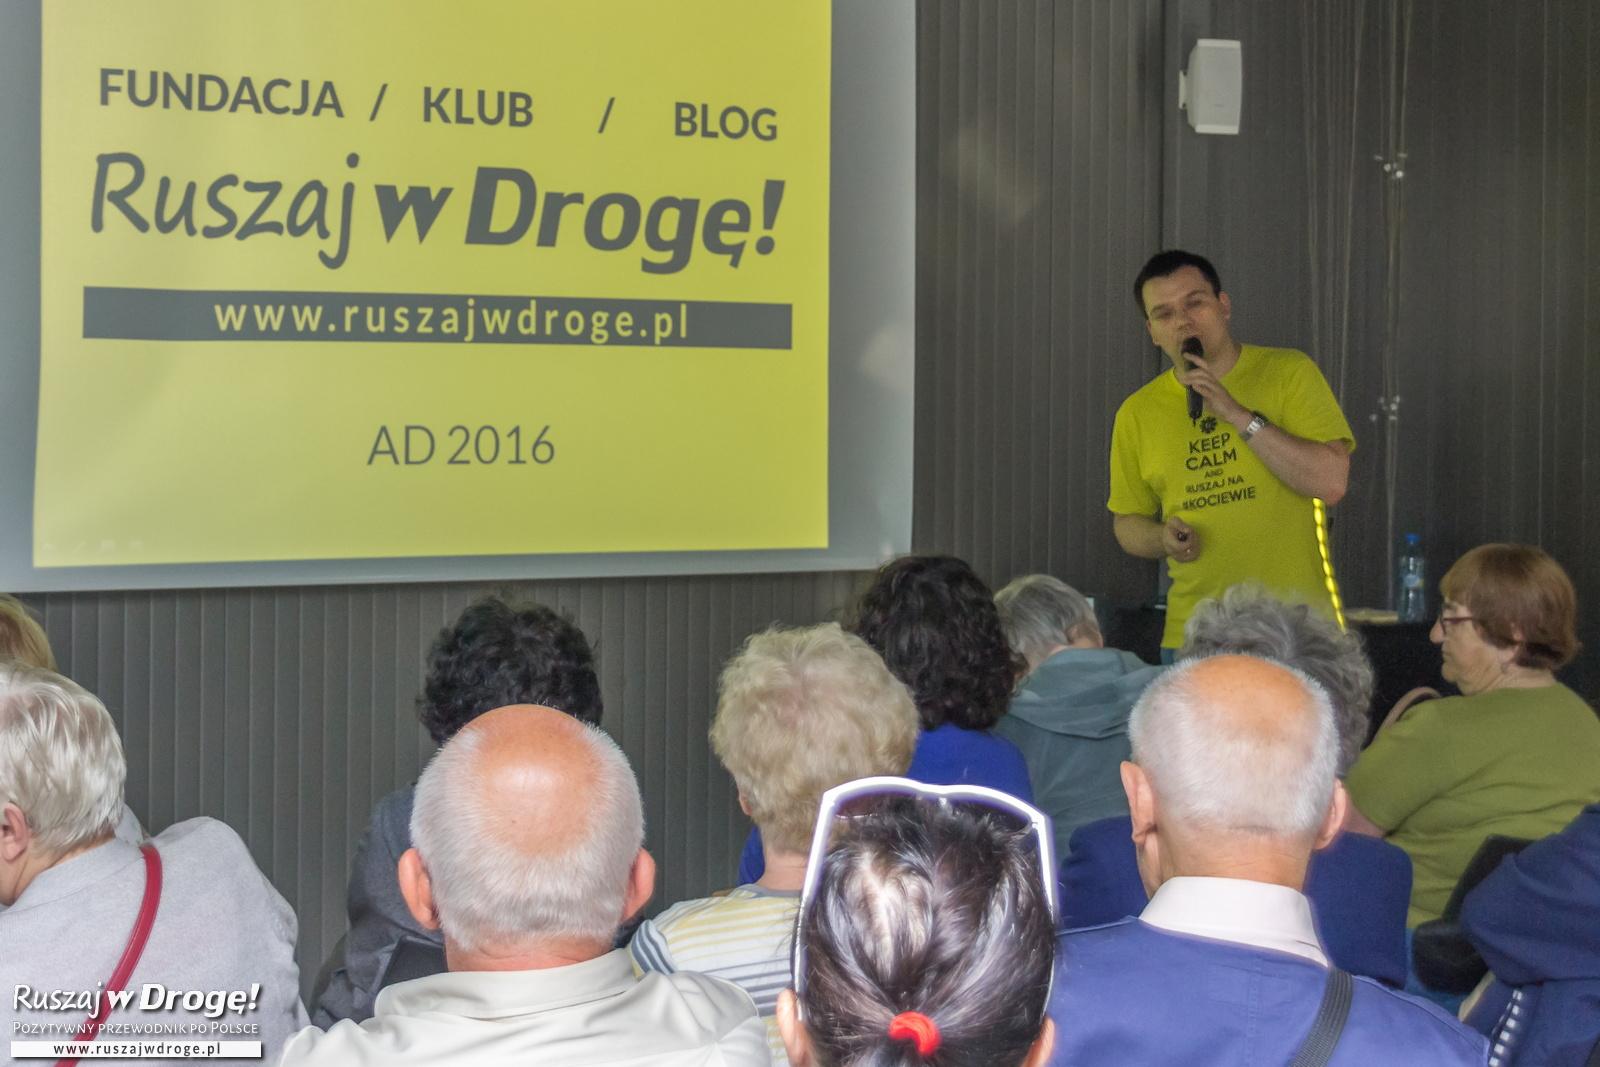 Ruszaj w Drogę! Fundacja Klub i Blog